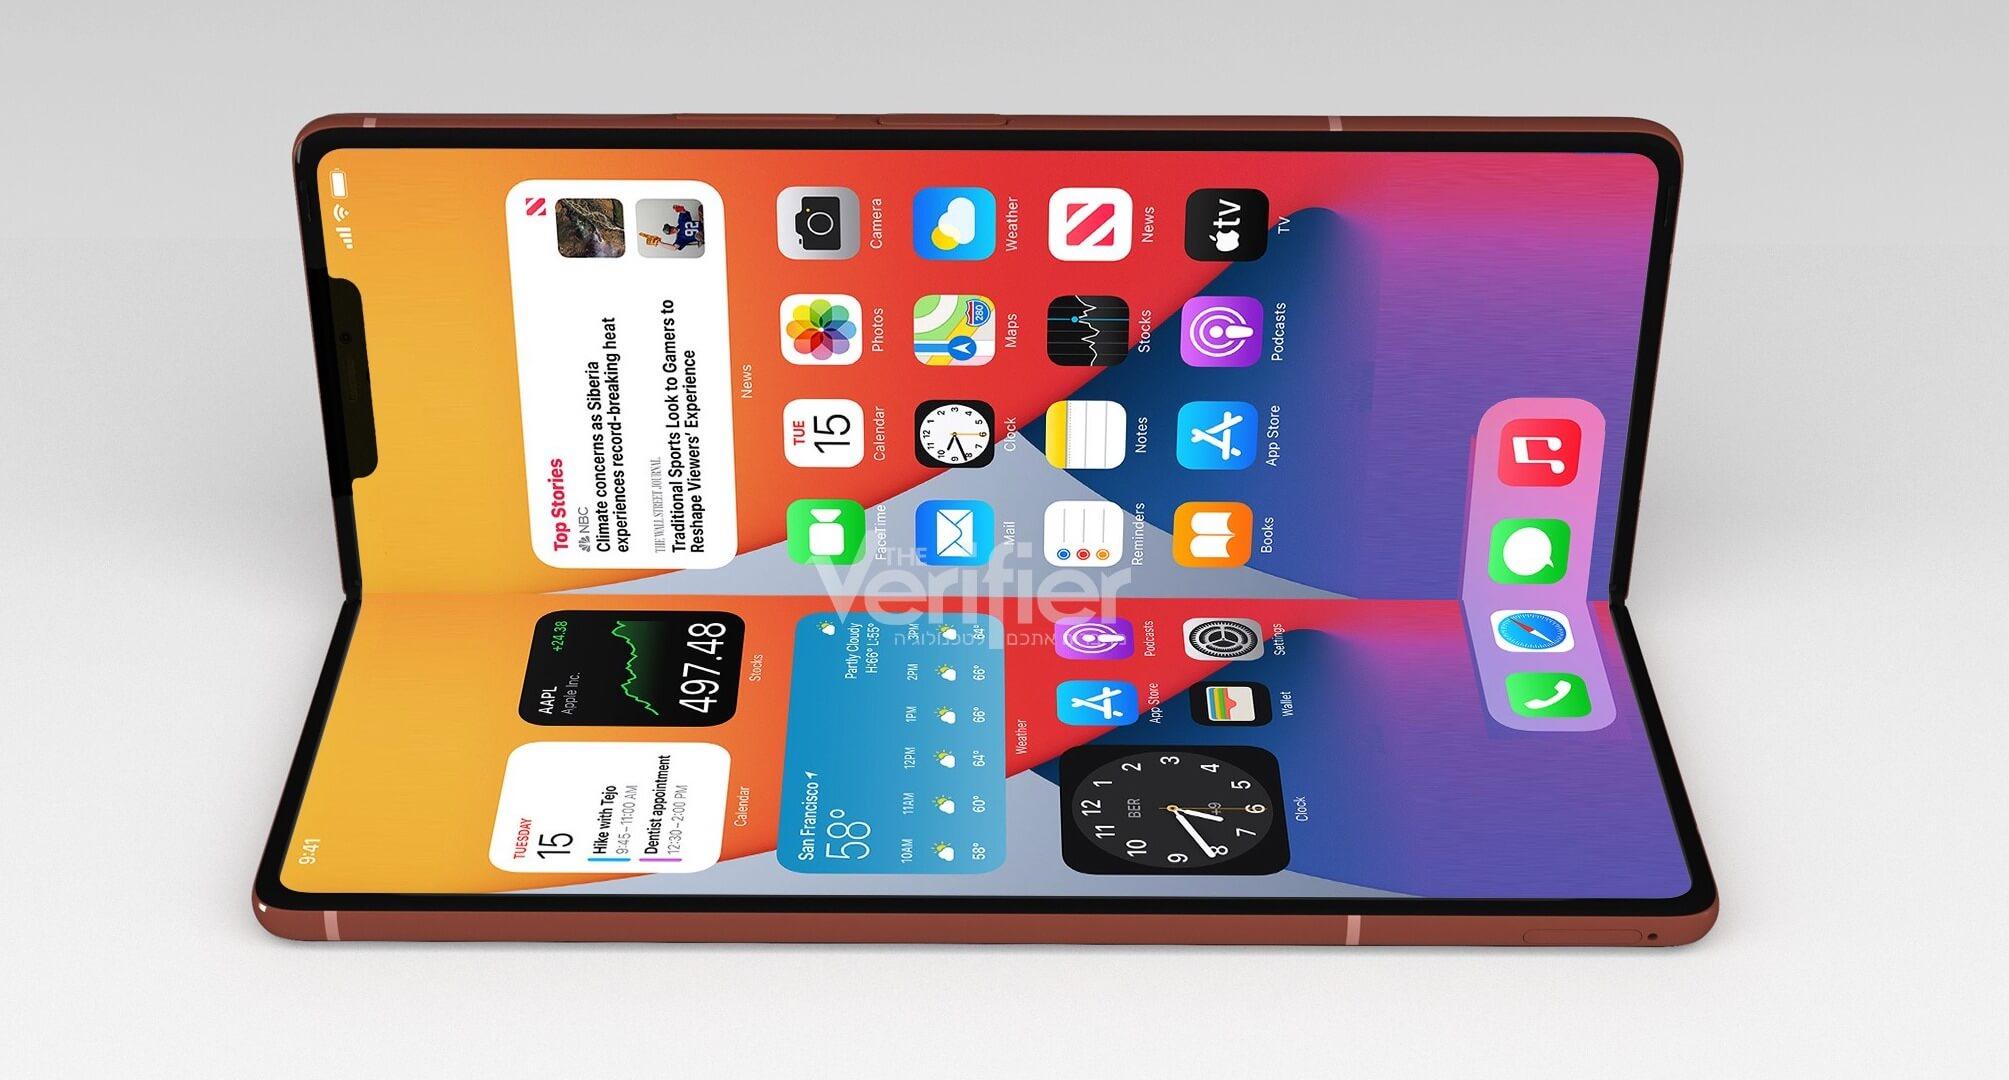 Apple «убьет» iPad Mini после выпуска складного iPhone